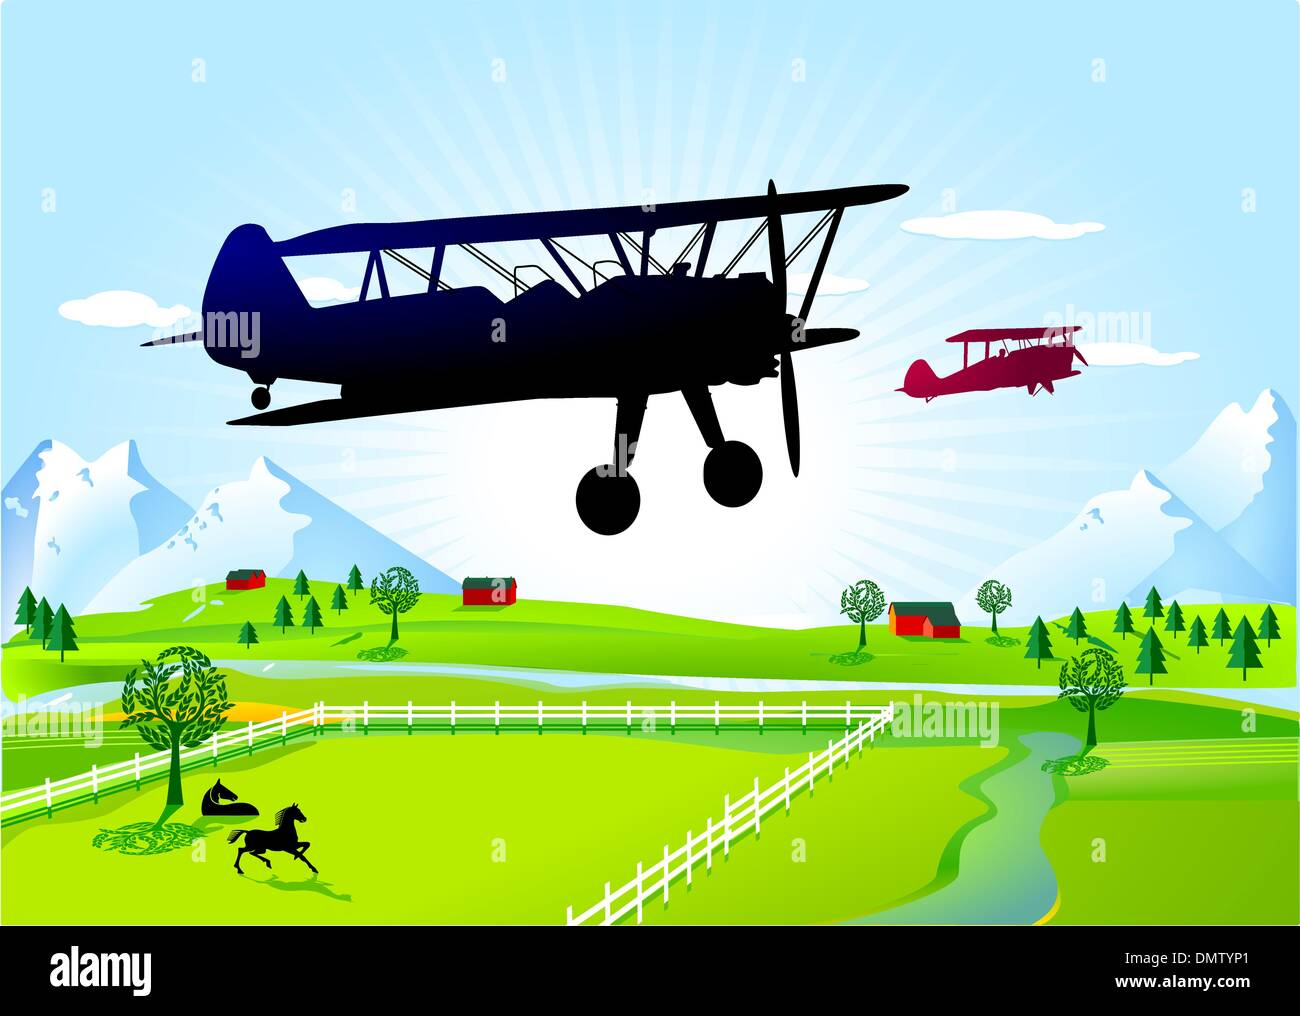 biplane - Stock Image